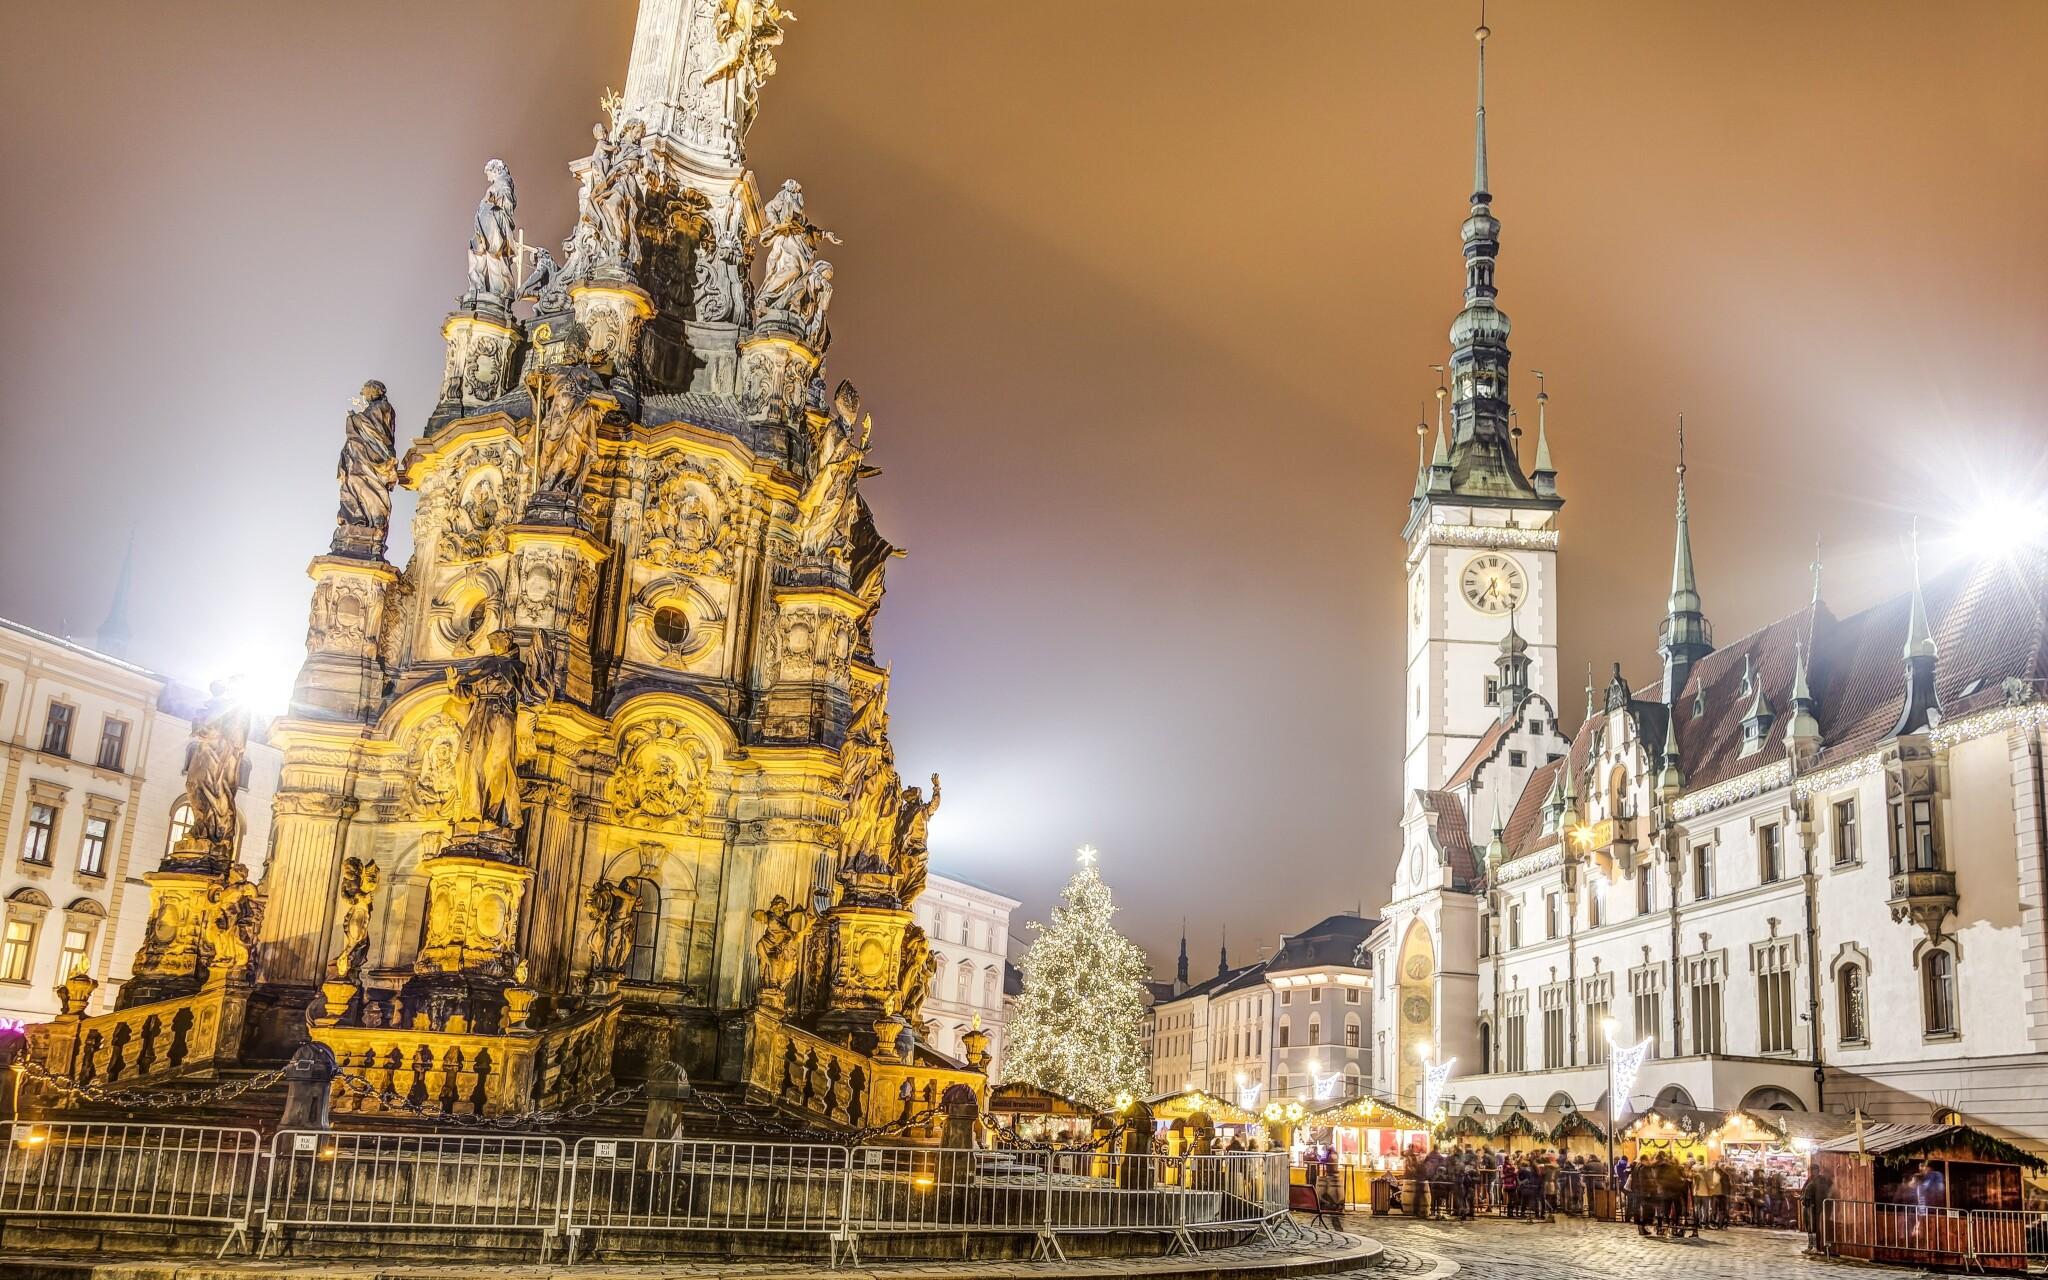 Vianočné trhy, Hotel Senimo, Olomouc